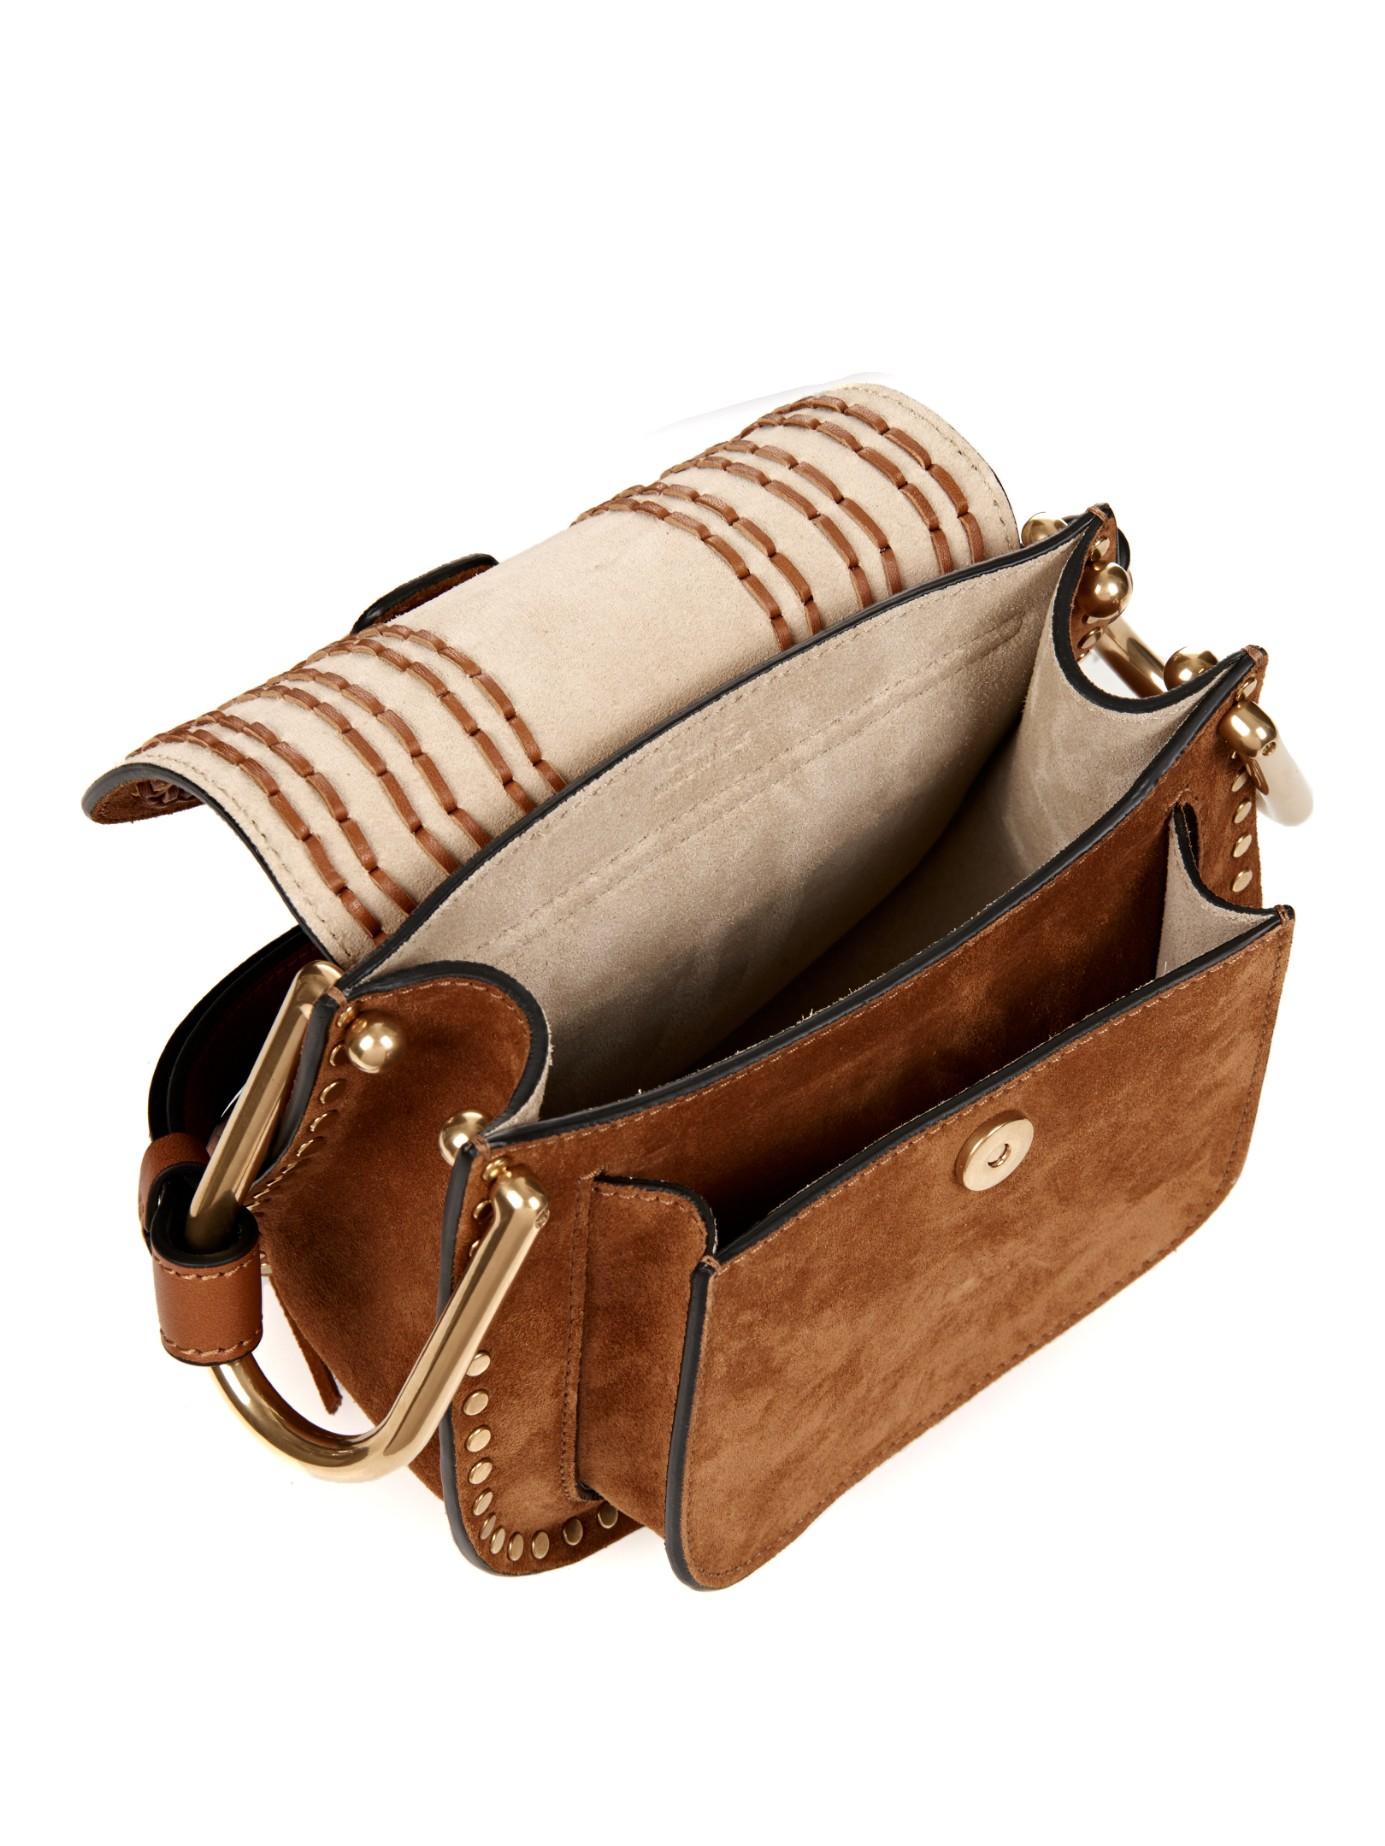 Chlo 233 Hudson Mini Suede Cross Body Bag In Tan Brown Lyst